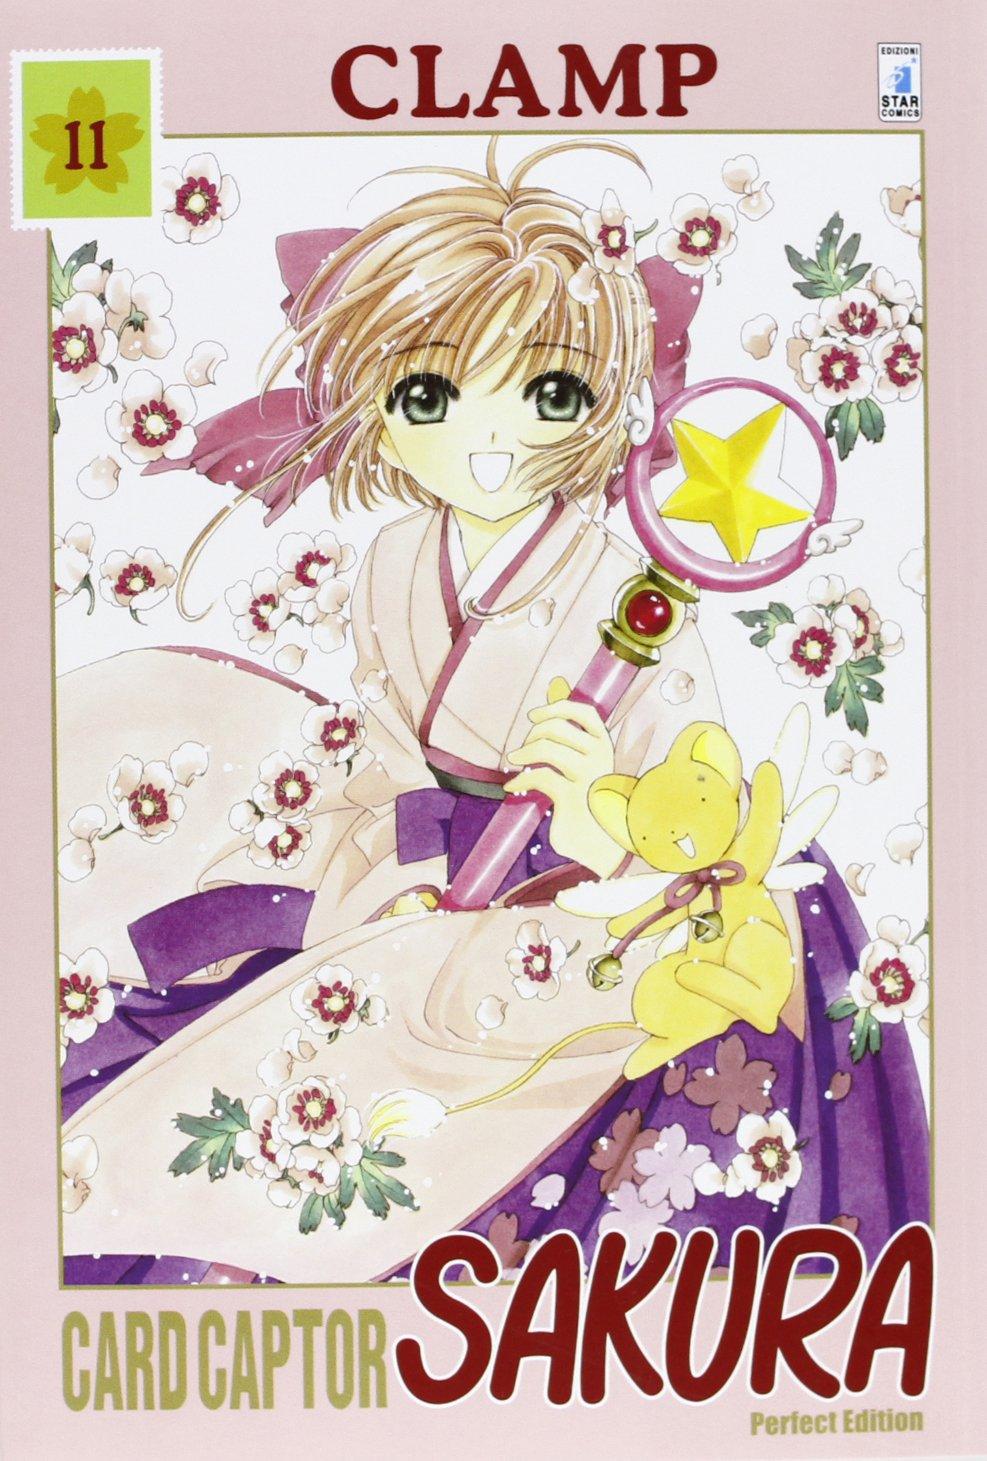 Card Captor Sakura. Perfect edition: 11 Copertina flessibile – 10 ott 2013 Clamp Yupa Star Comics 8864203125